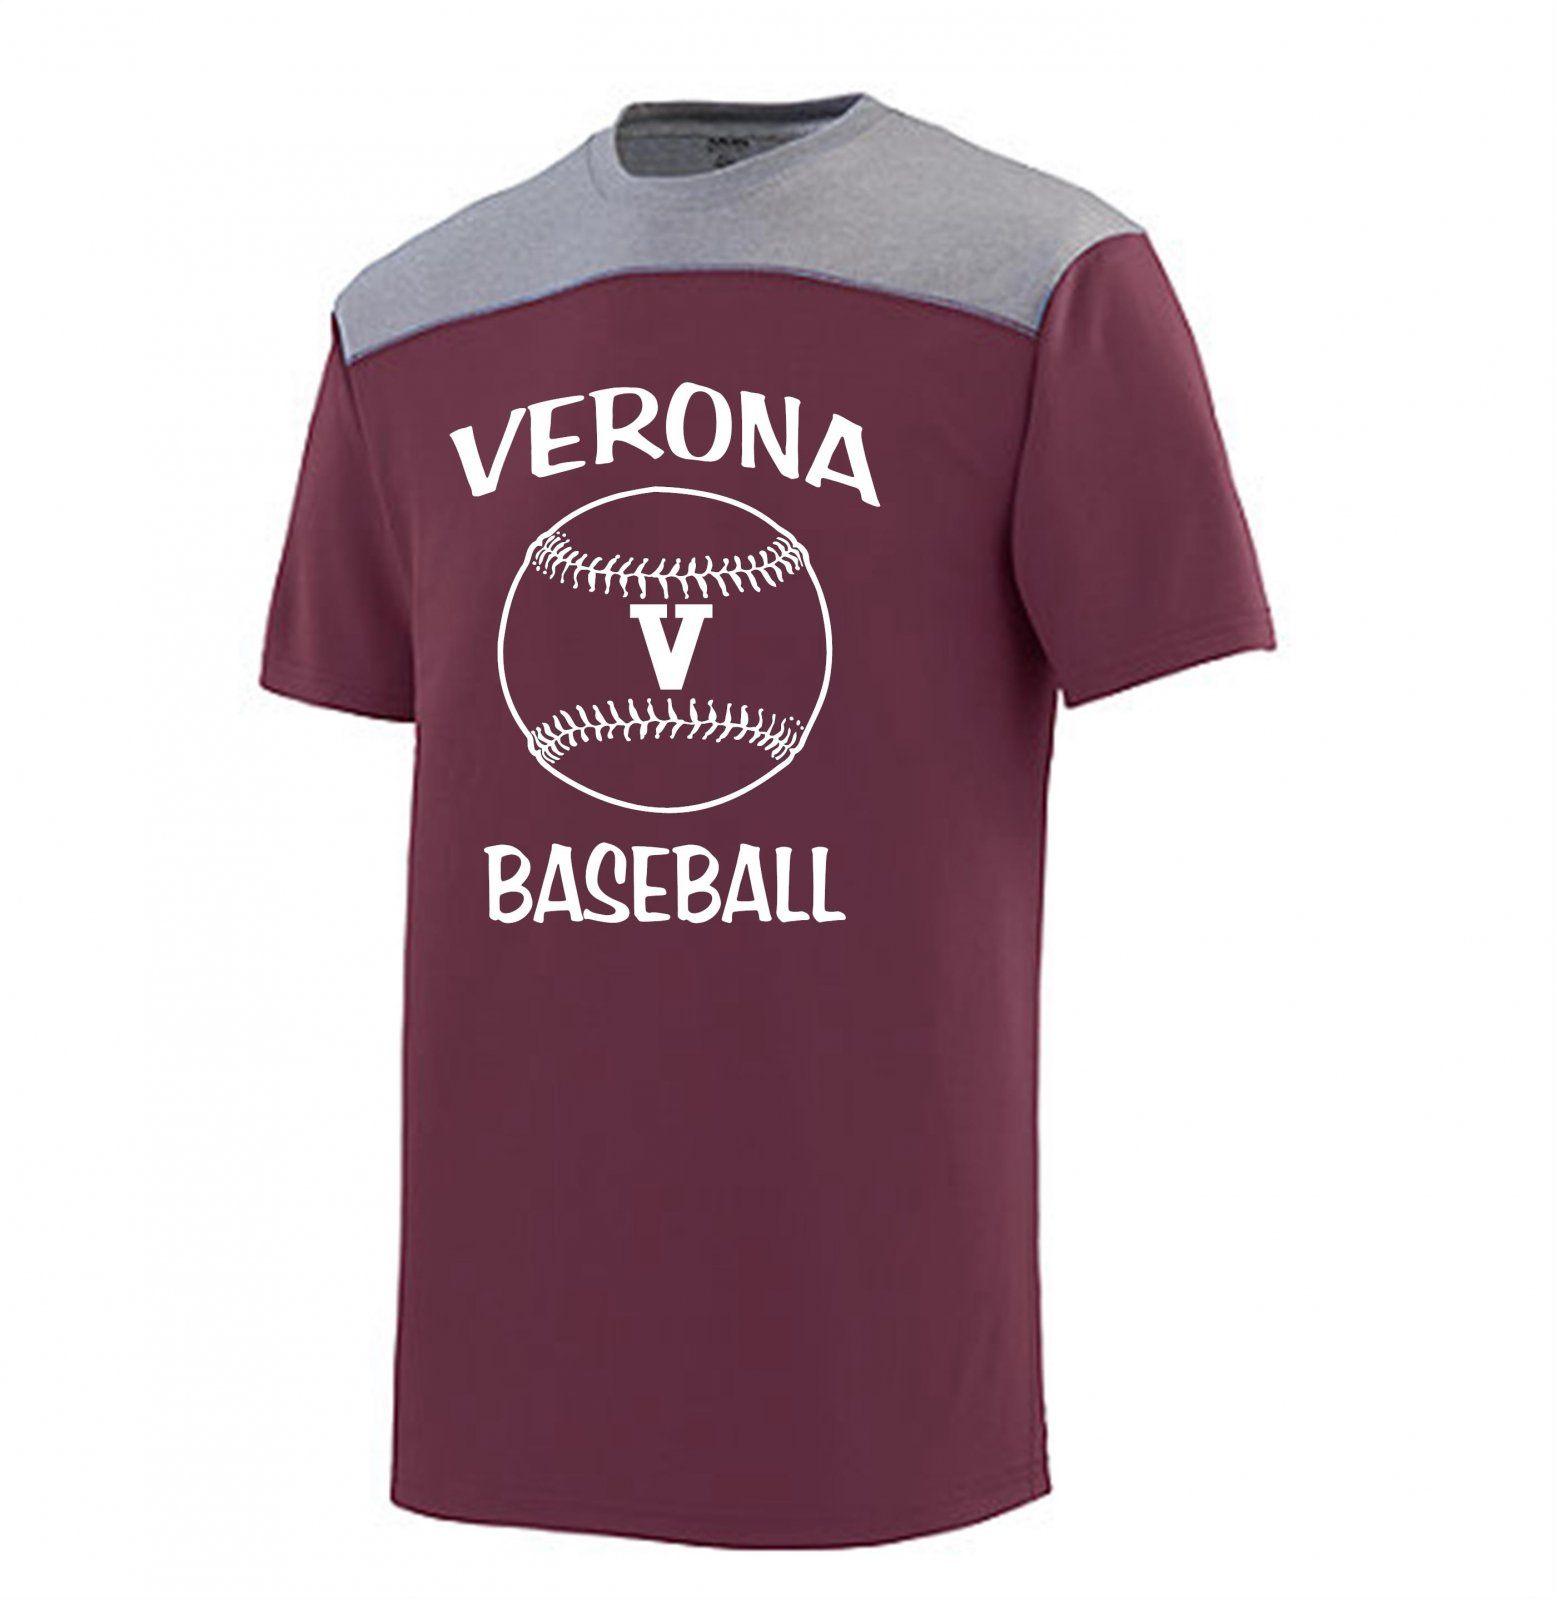 Augusta Challenge Verona Baseball Shirt